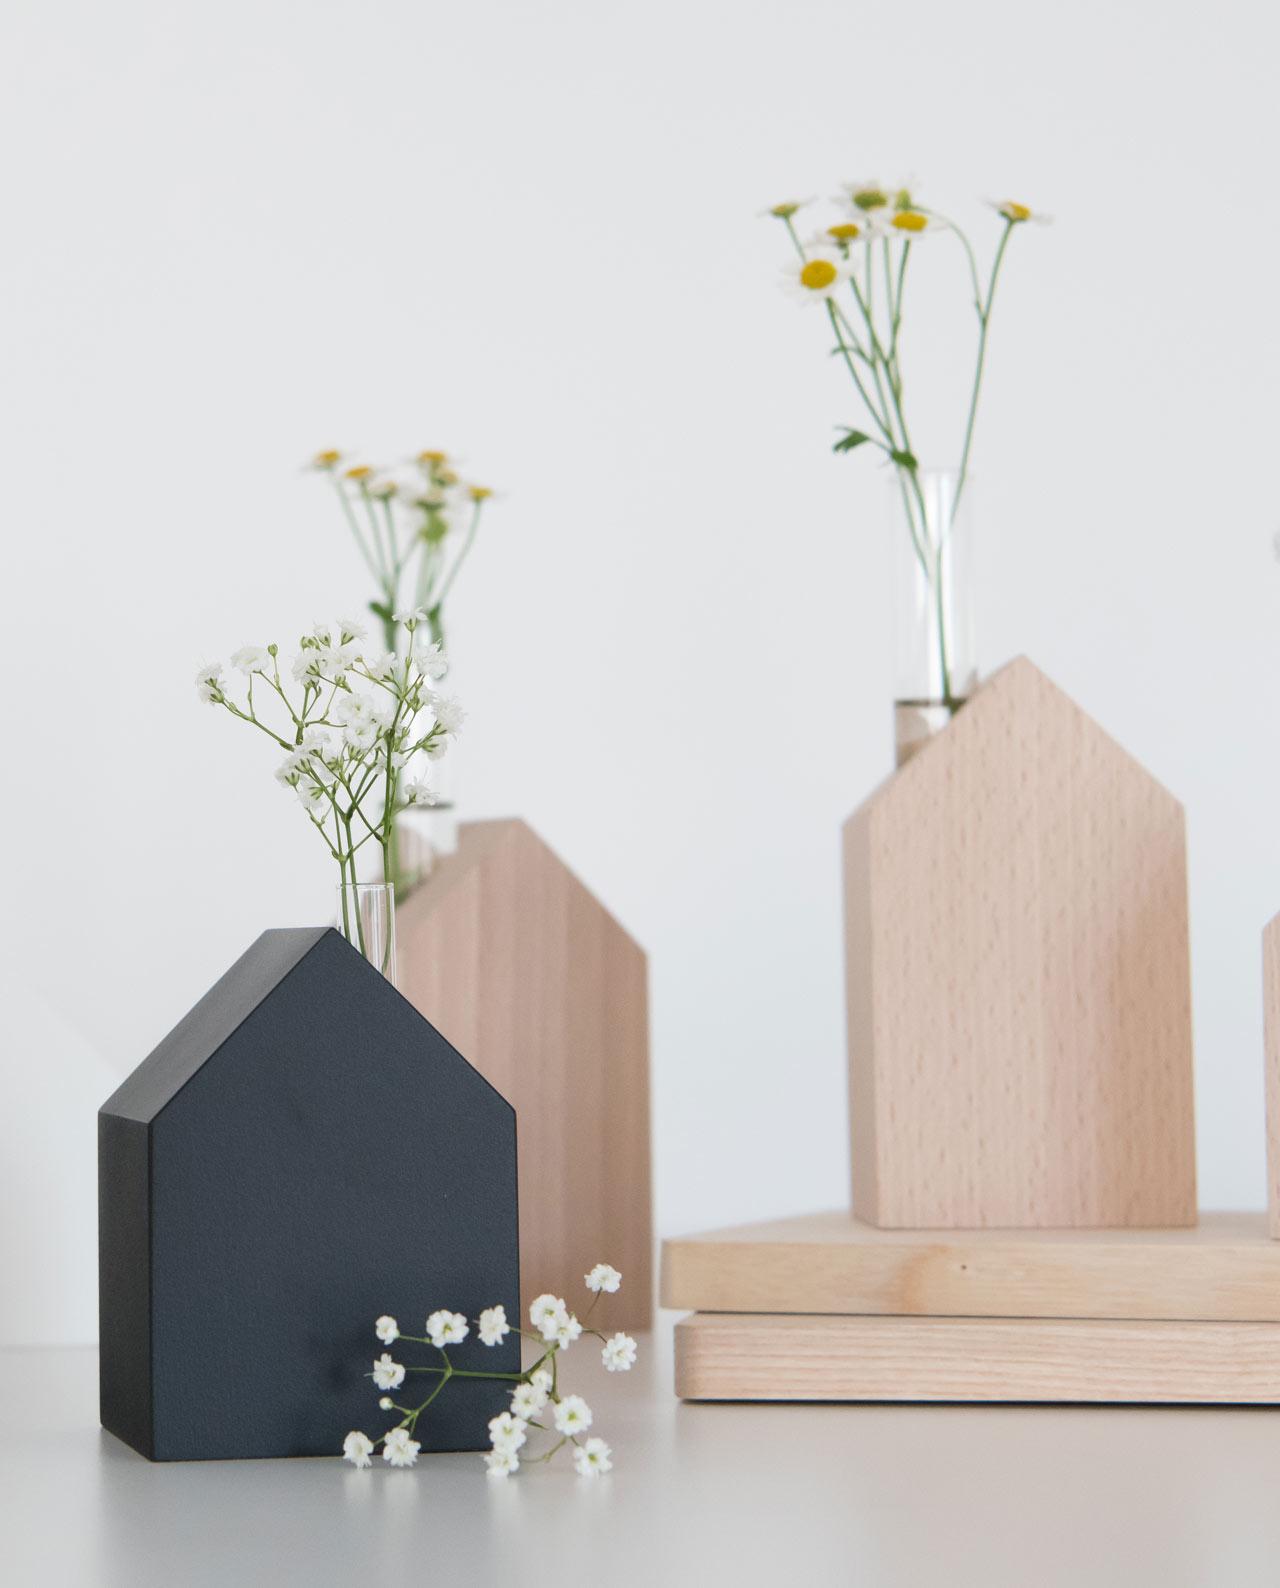 dekohaus aus holz tafellack schwarz daheim deko. Black Bedroom Furniture Sets. Home Design Ideas